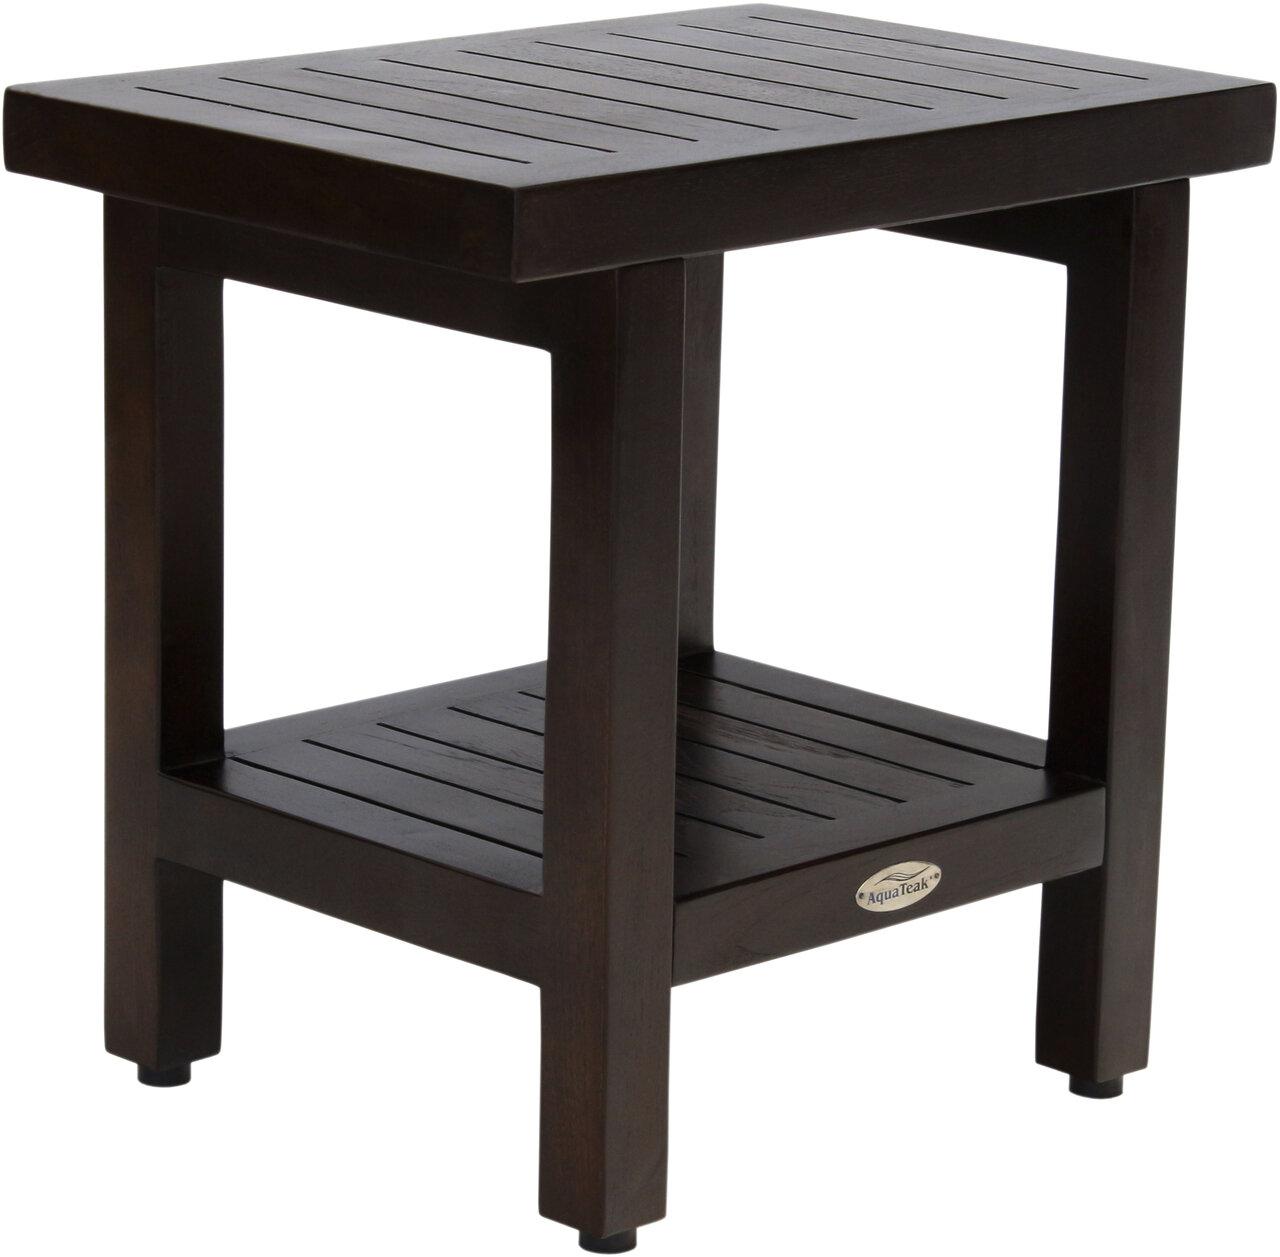 Brilliant Spa Mocha Shield Teak Shower Bench Theyellowbook Wood Chair Design Ideas Theyellowbookinfo